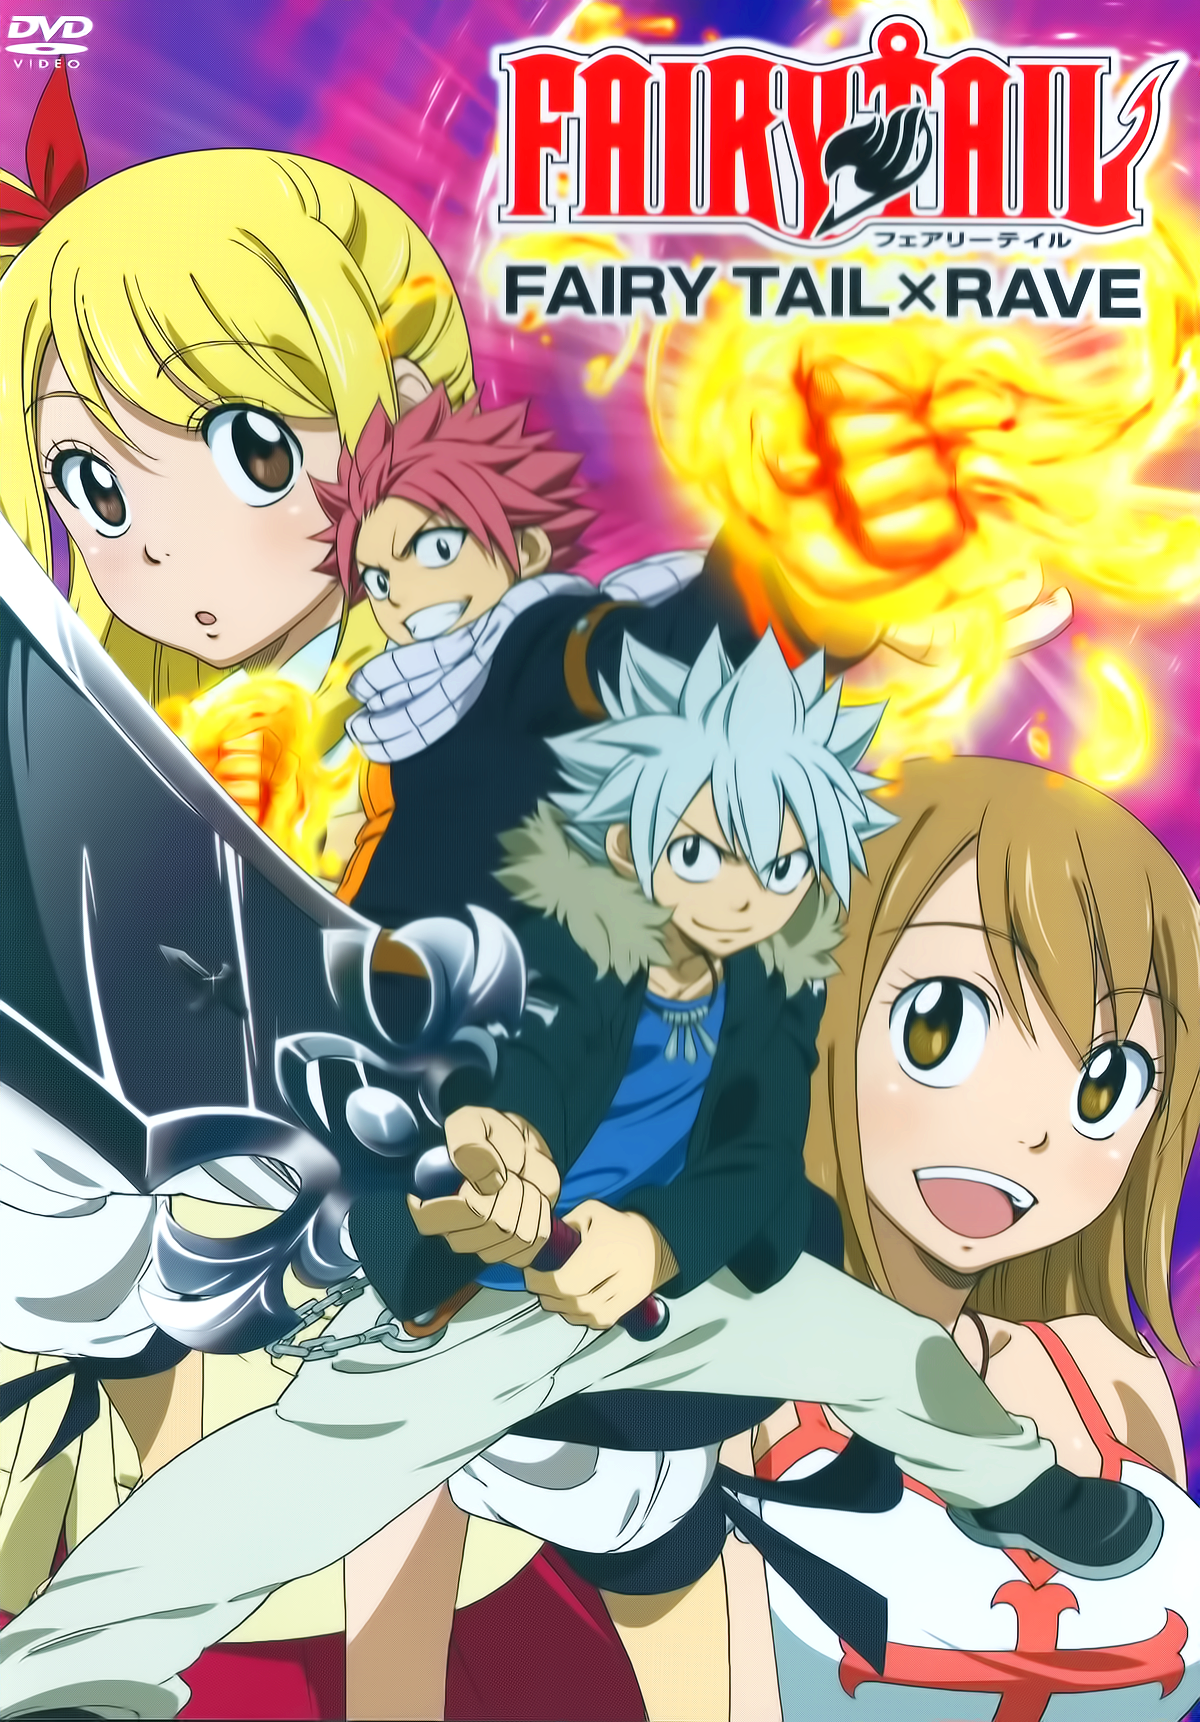 Image - Fairy Tail OVA 6 Fairy Tail X Rave.png | AnimeVice